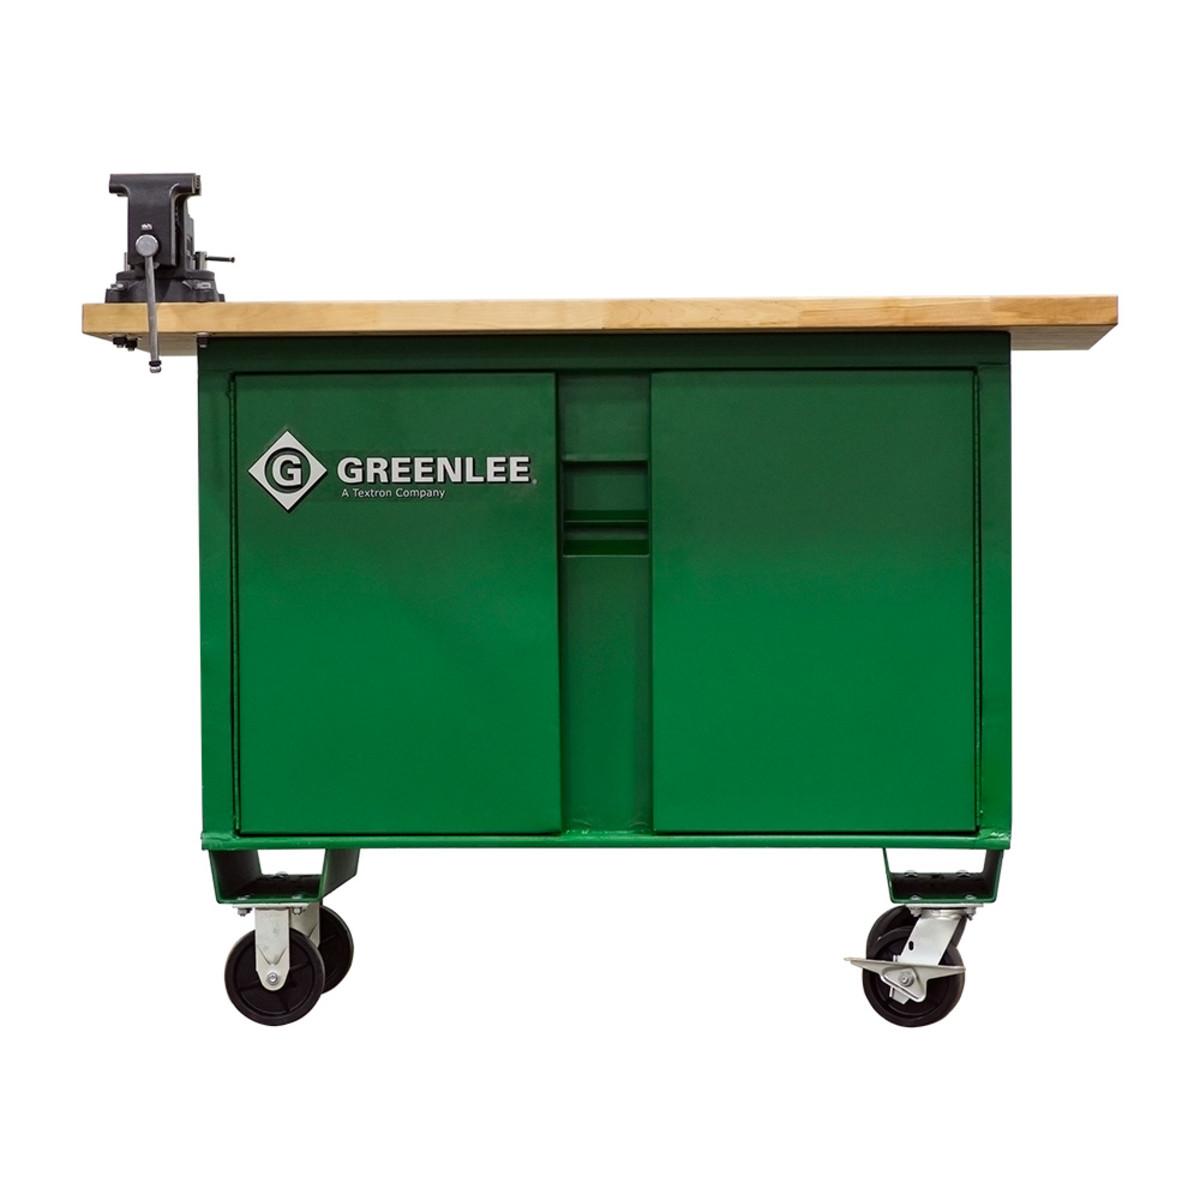 GRT3548SLS BOX, TRAINING CENTER 36X48, GREENLEE